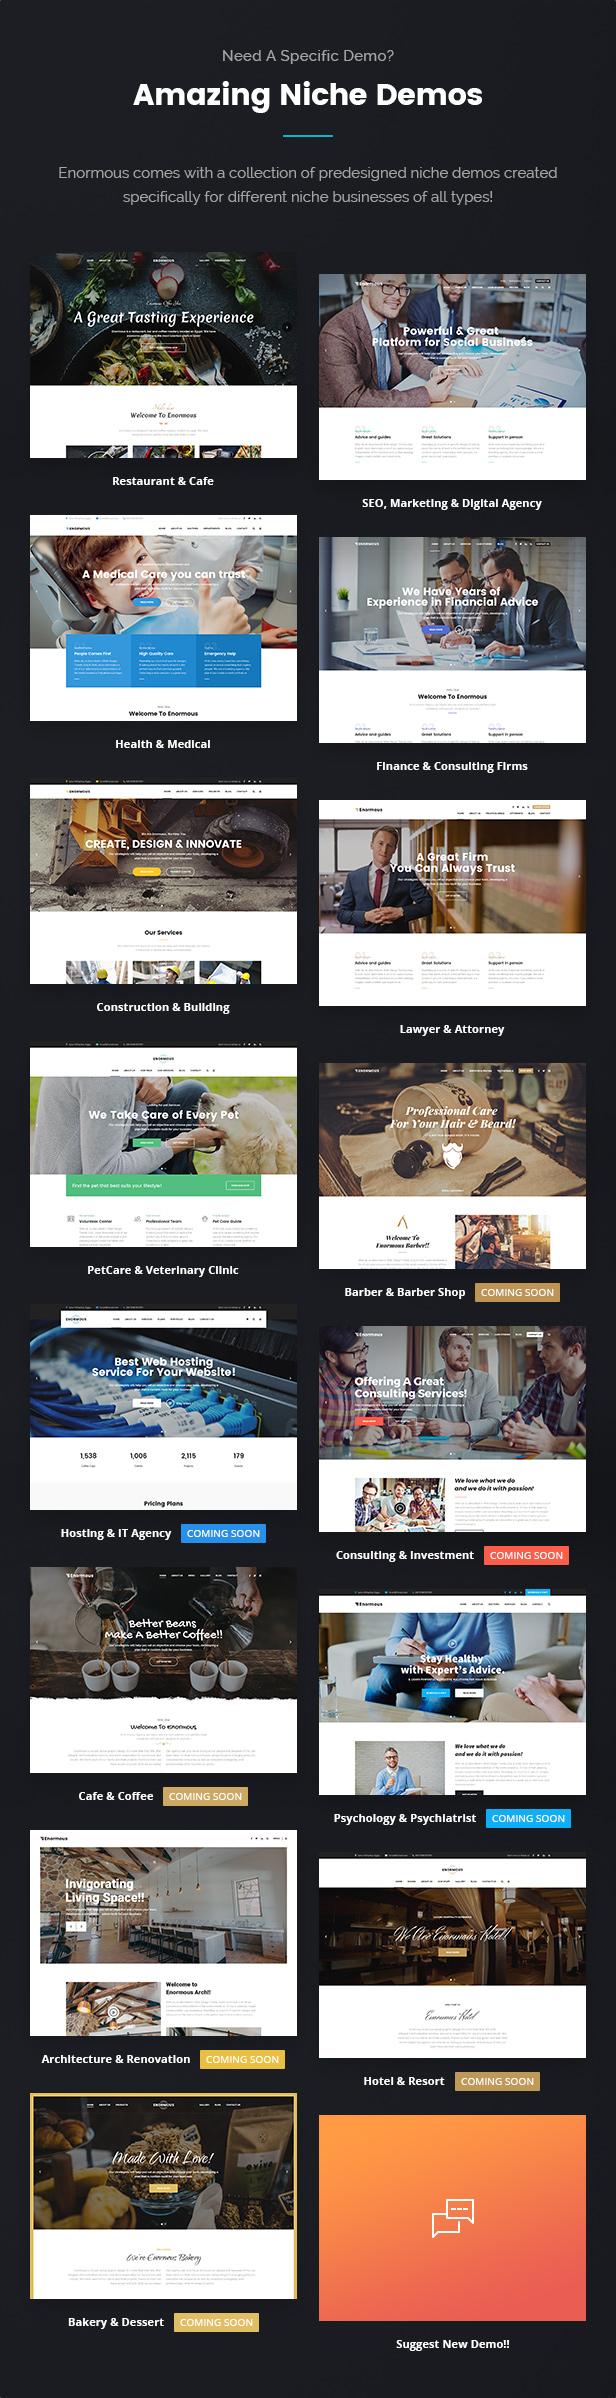 Enormous Business - Responsive Multi-Purpose WordPress Theme - 6